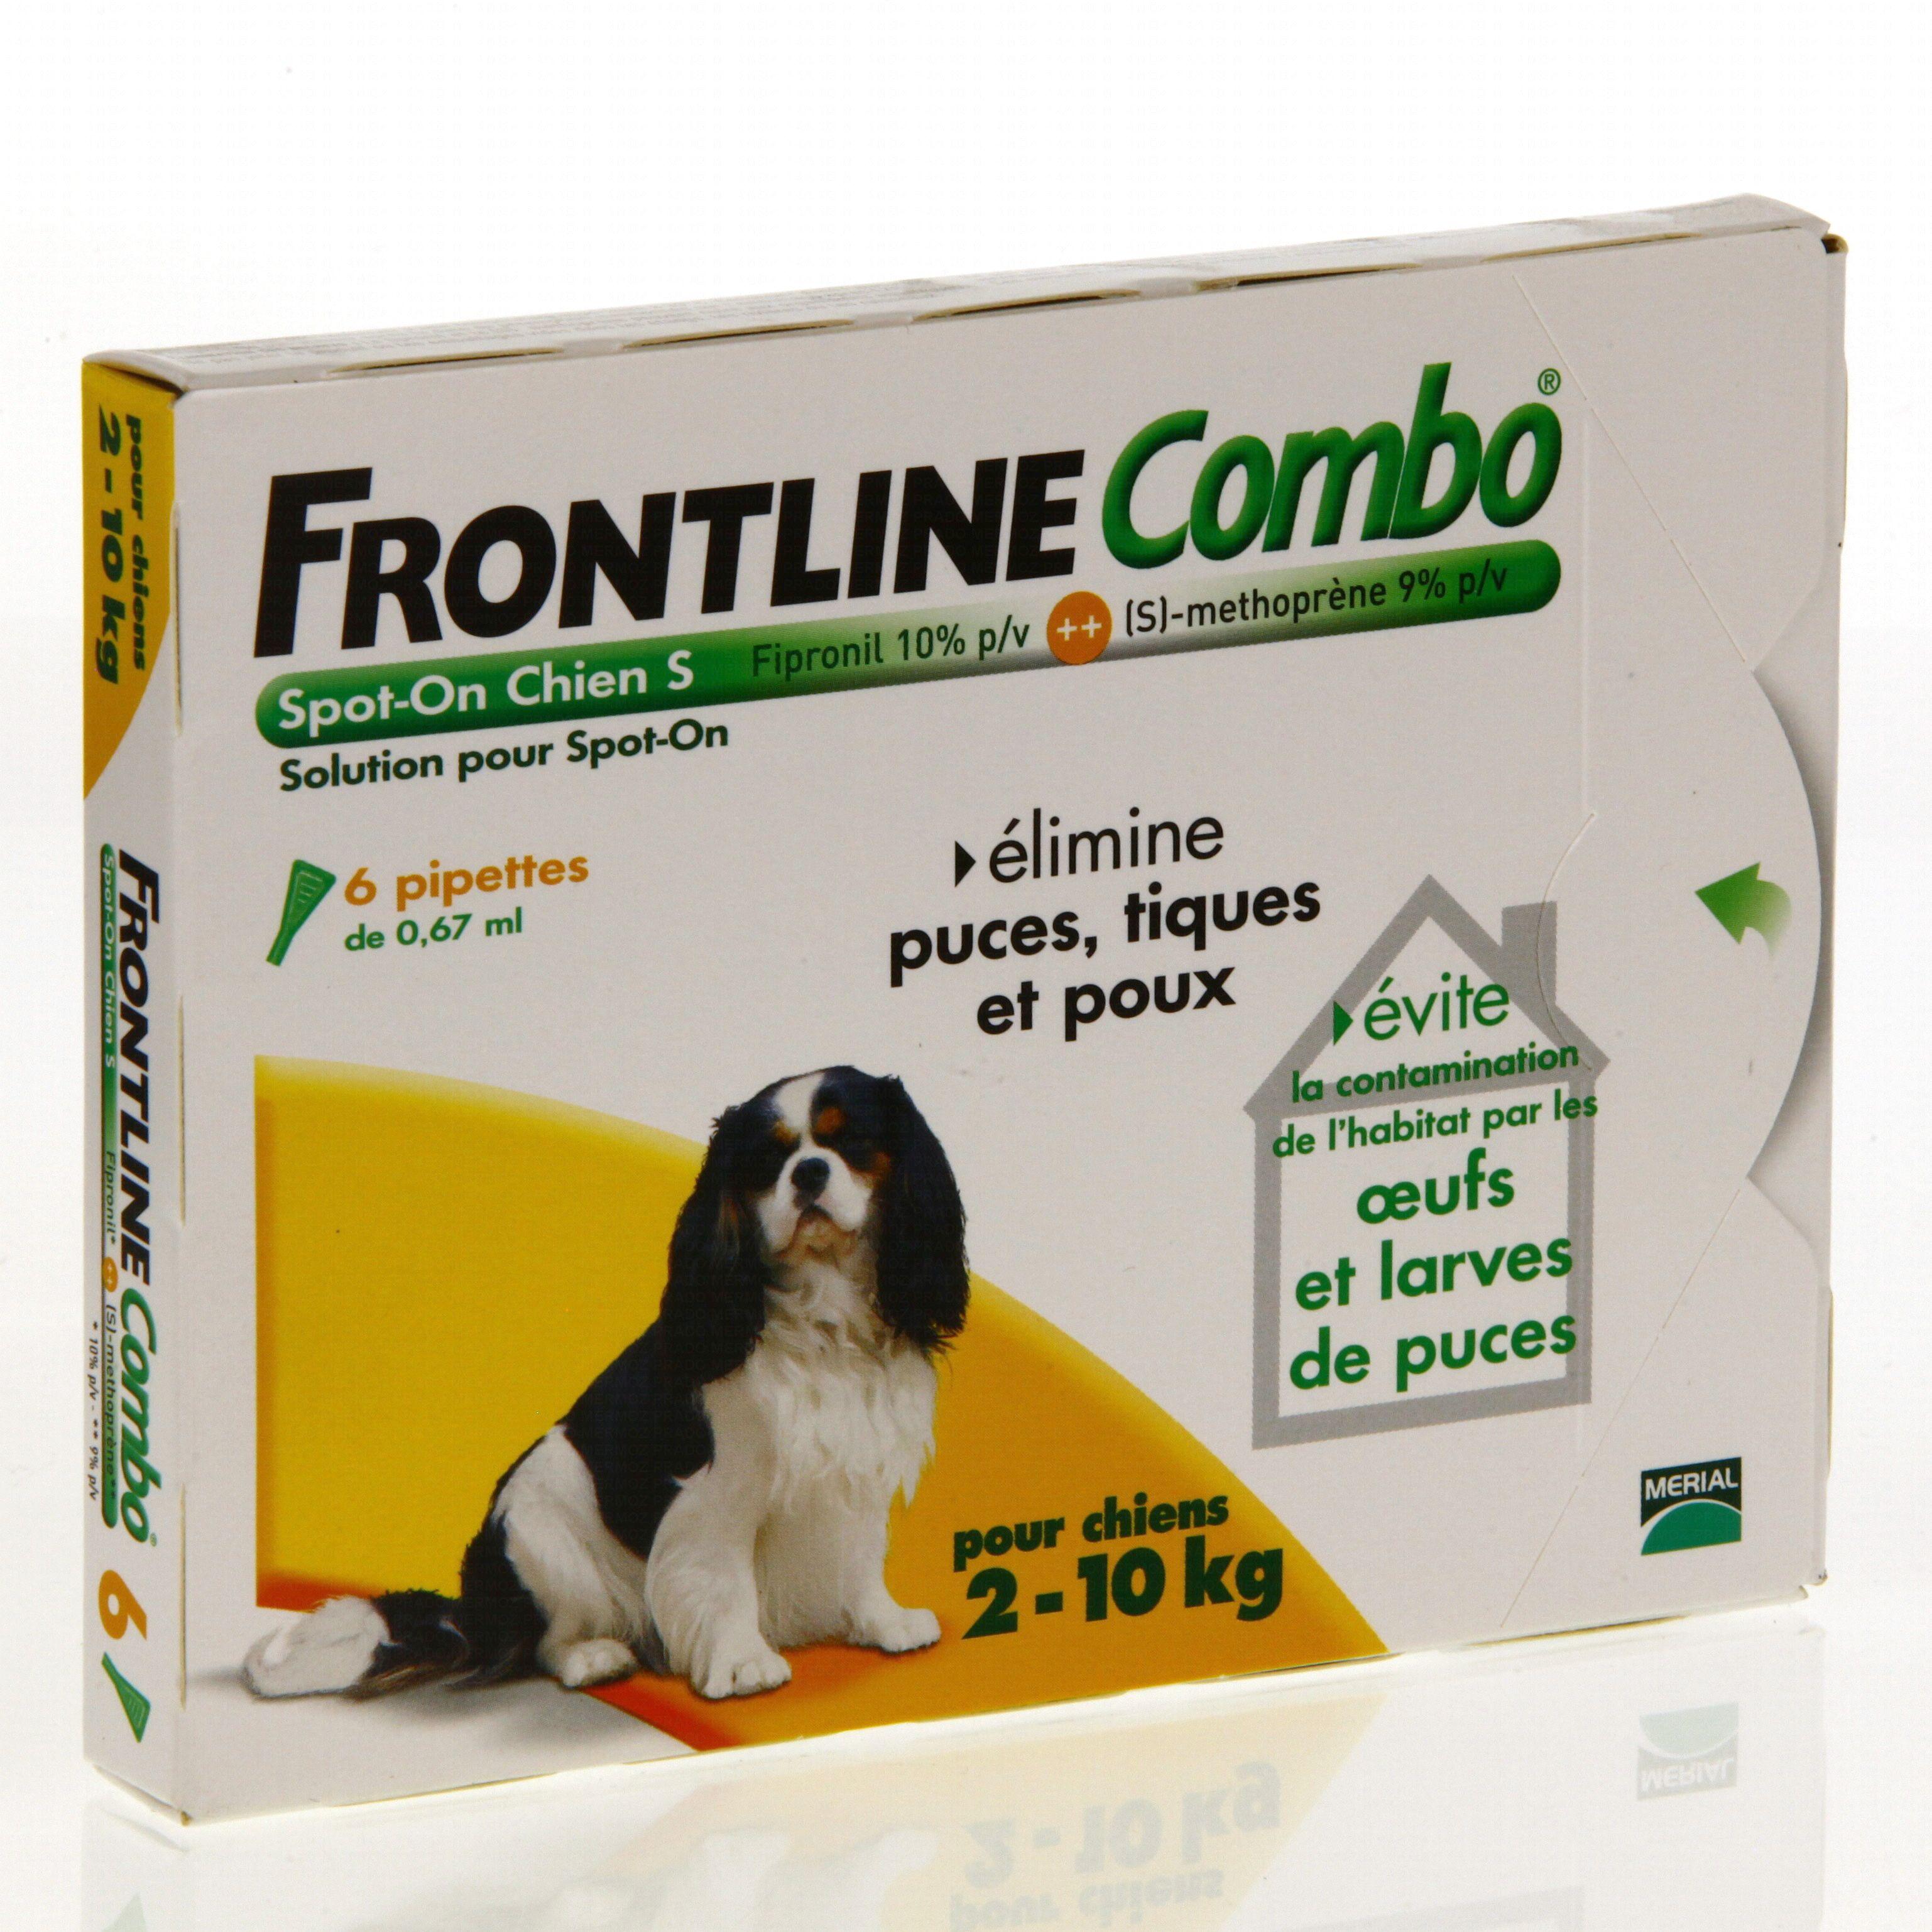 Prix frontline combo - Frontline combo chat pas cher ...